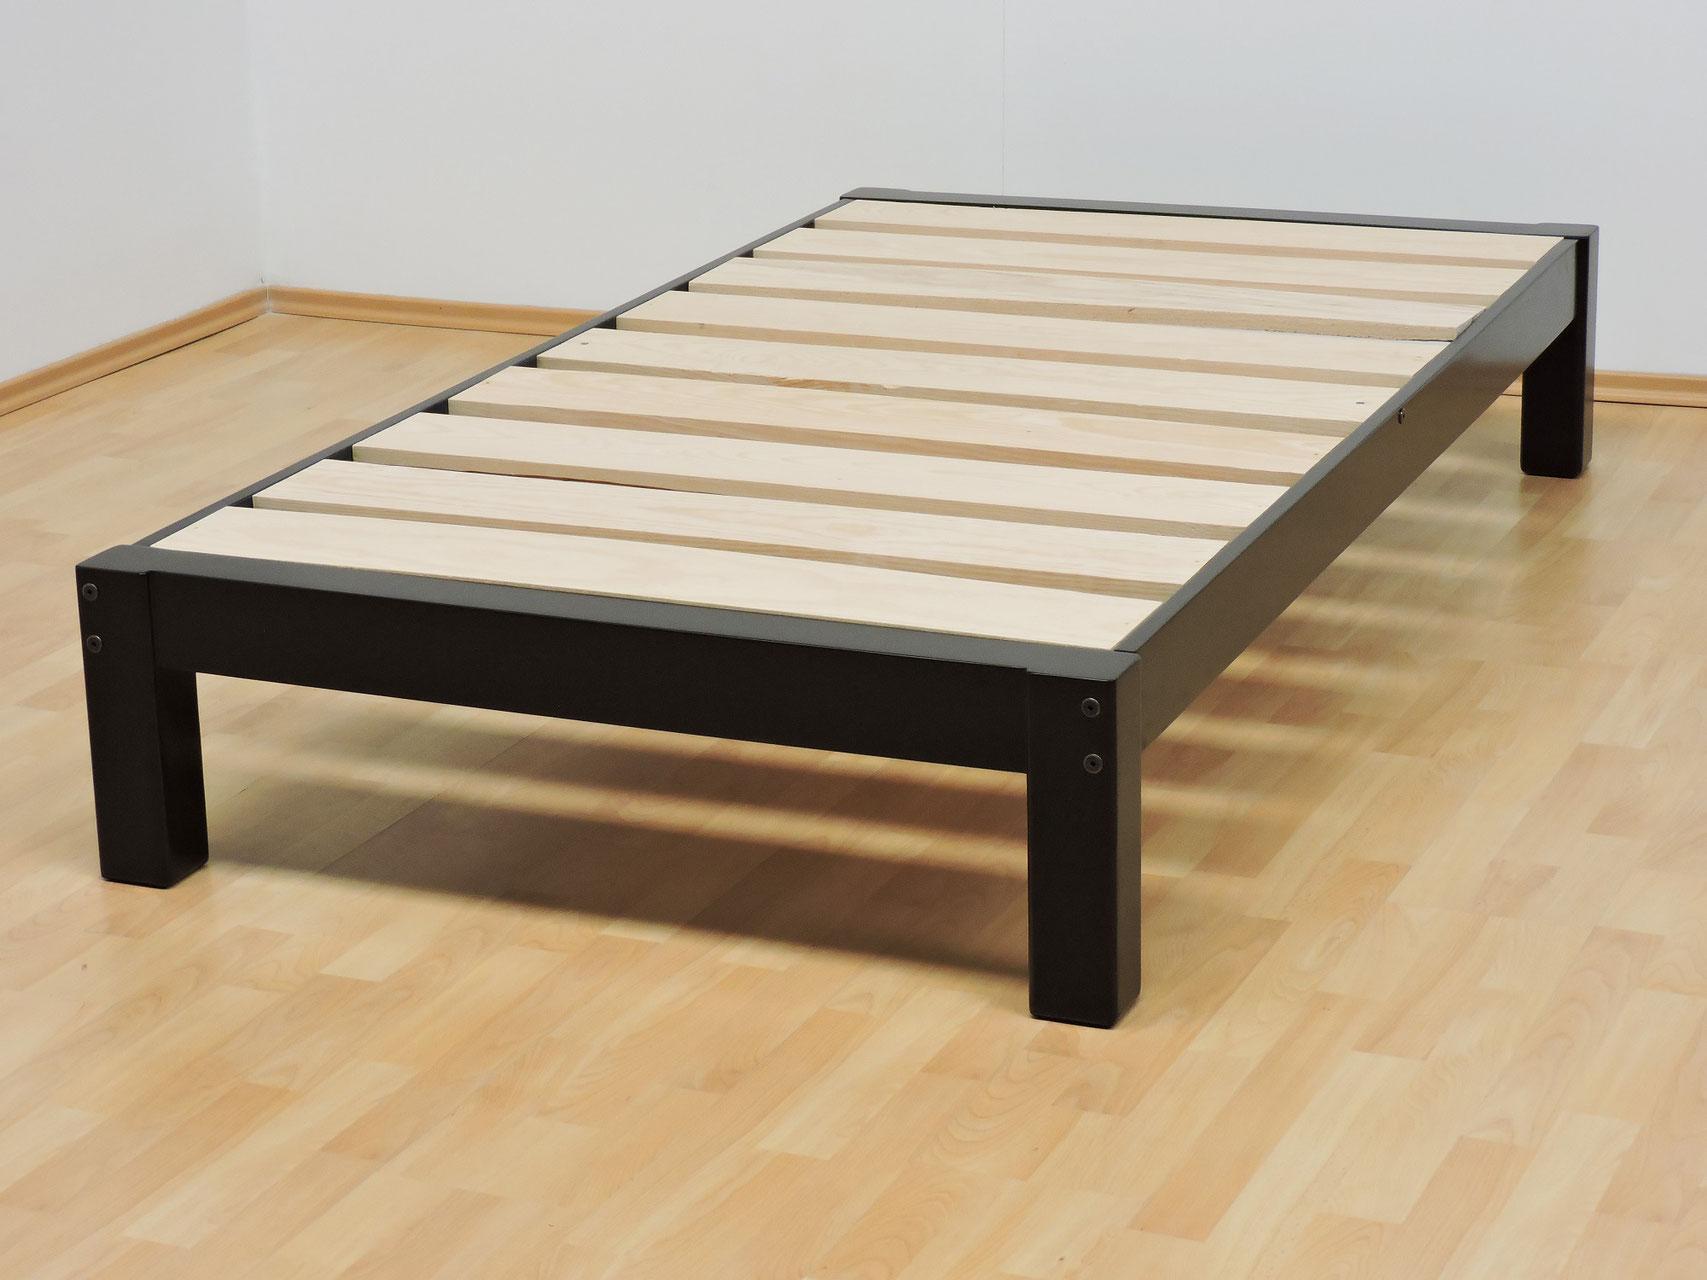 BASES - Muebles GM (Muebles de Madera)